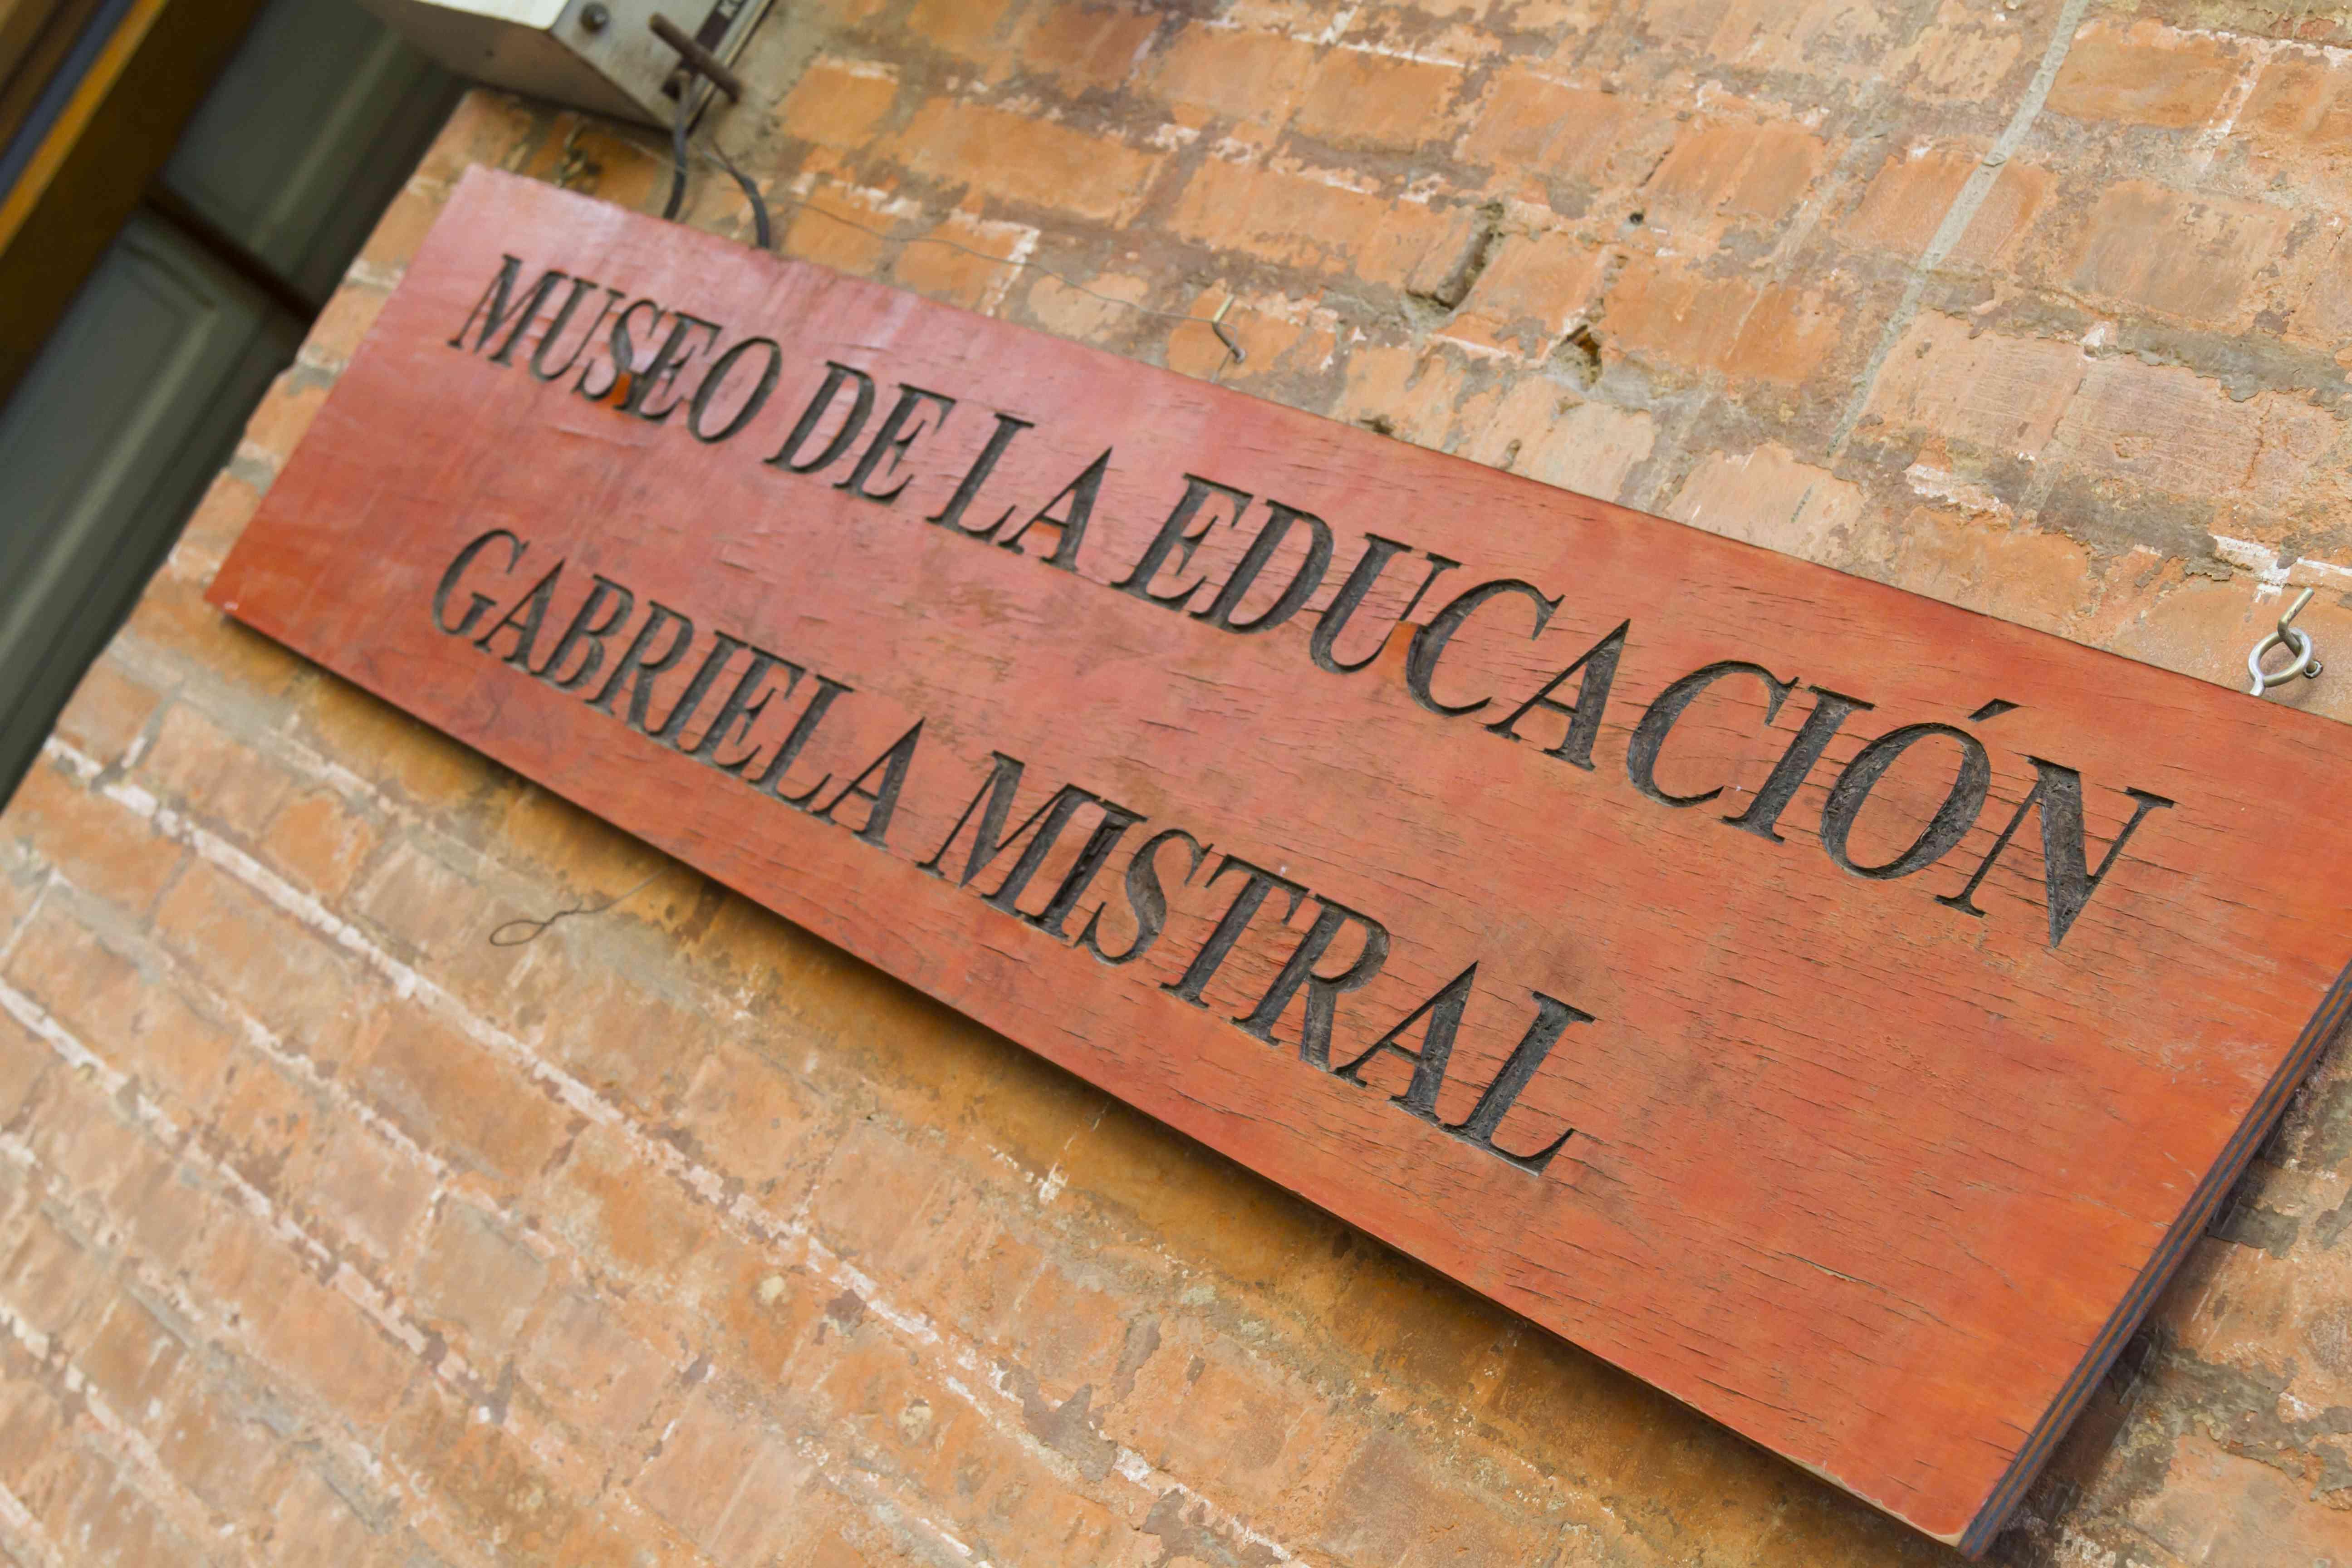 Education Museum named after Gabriela Mistral